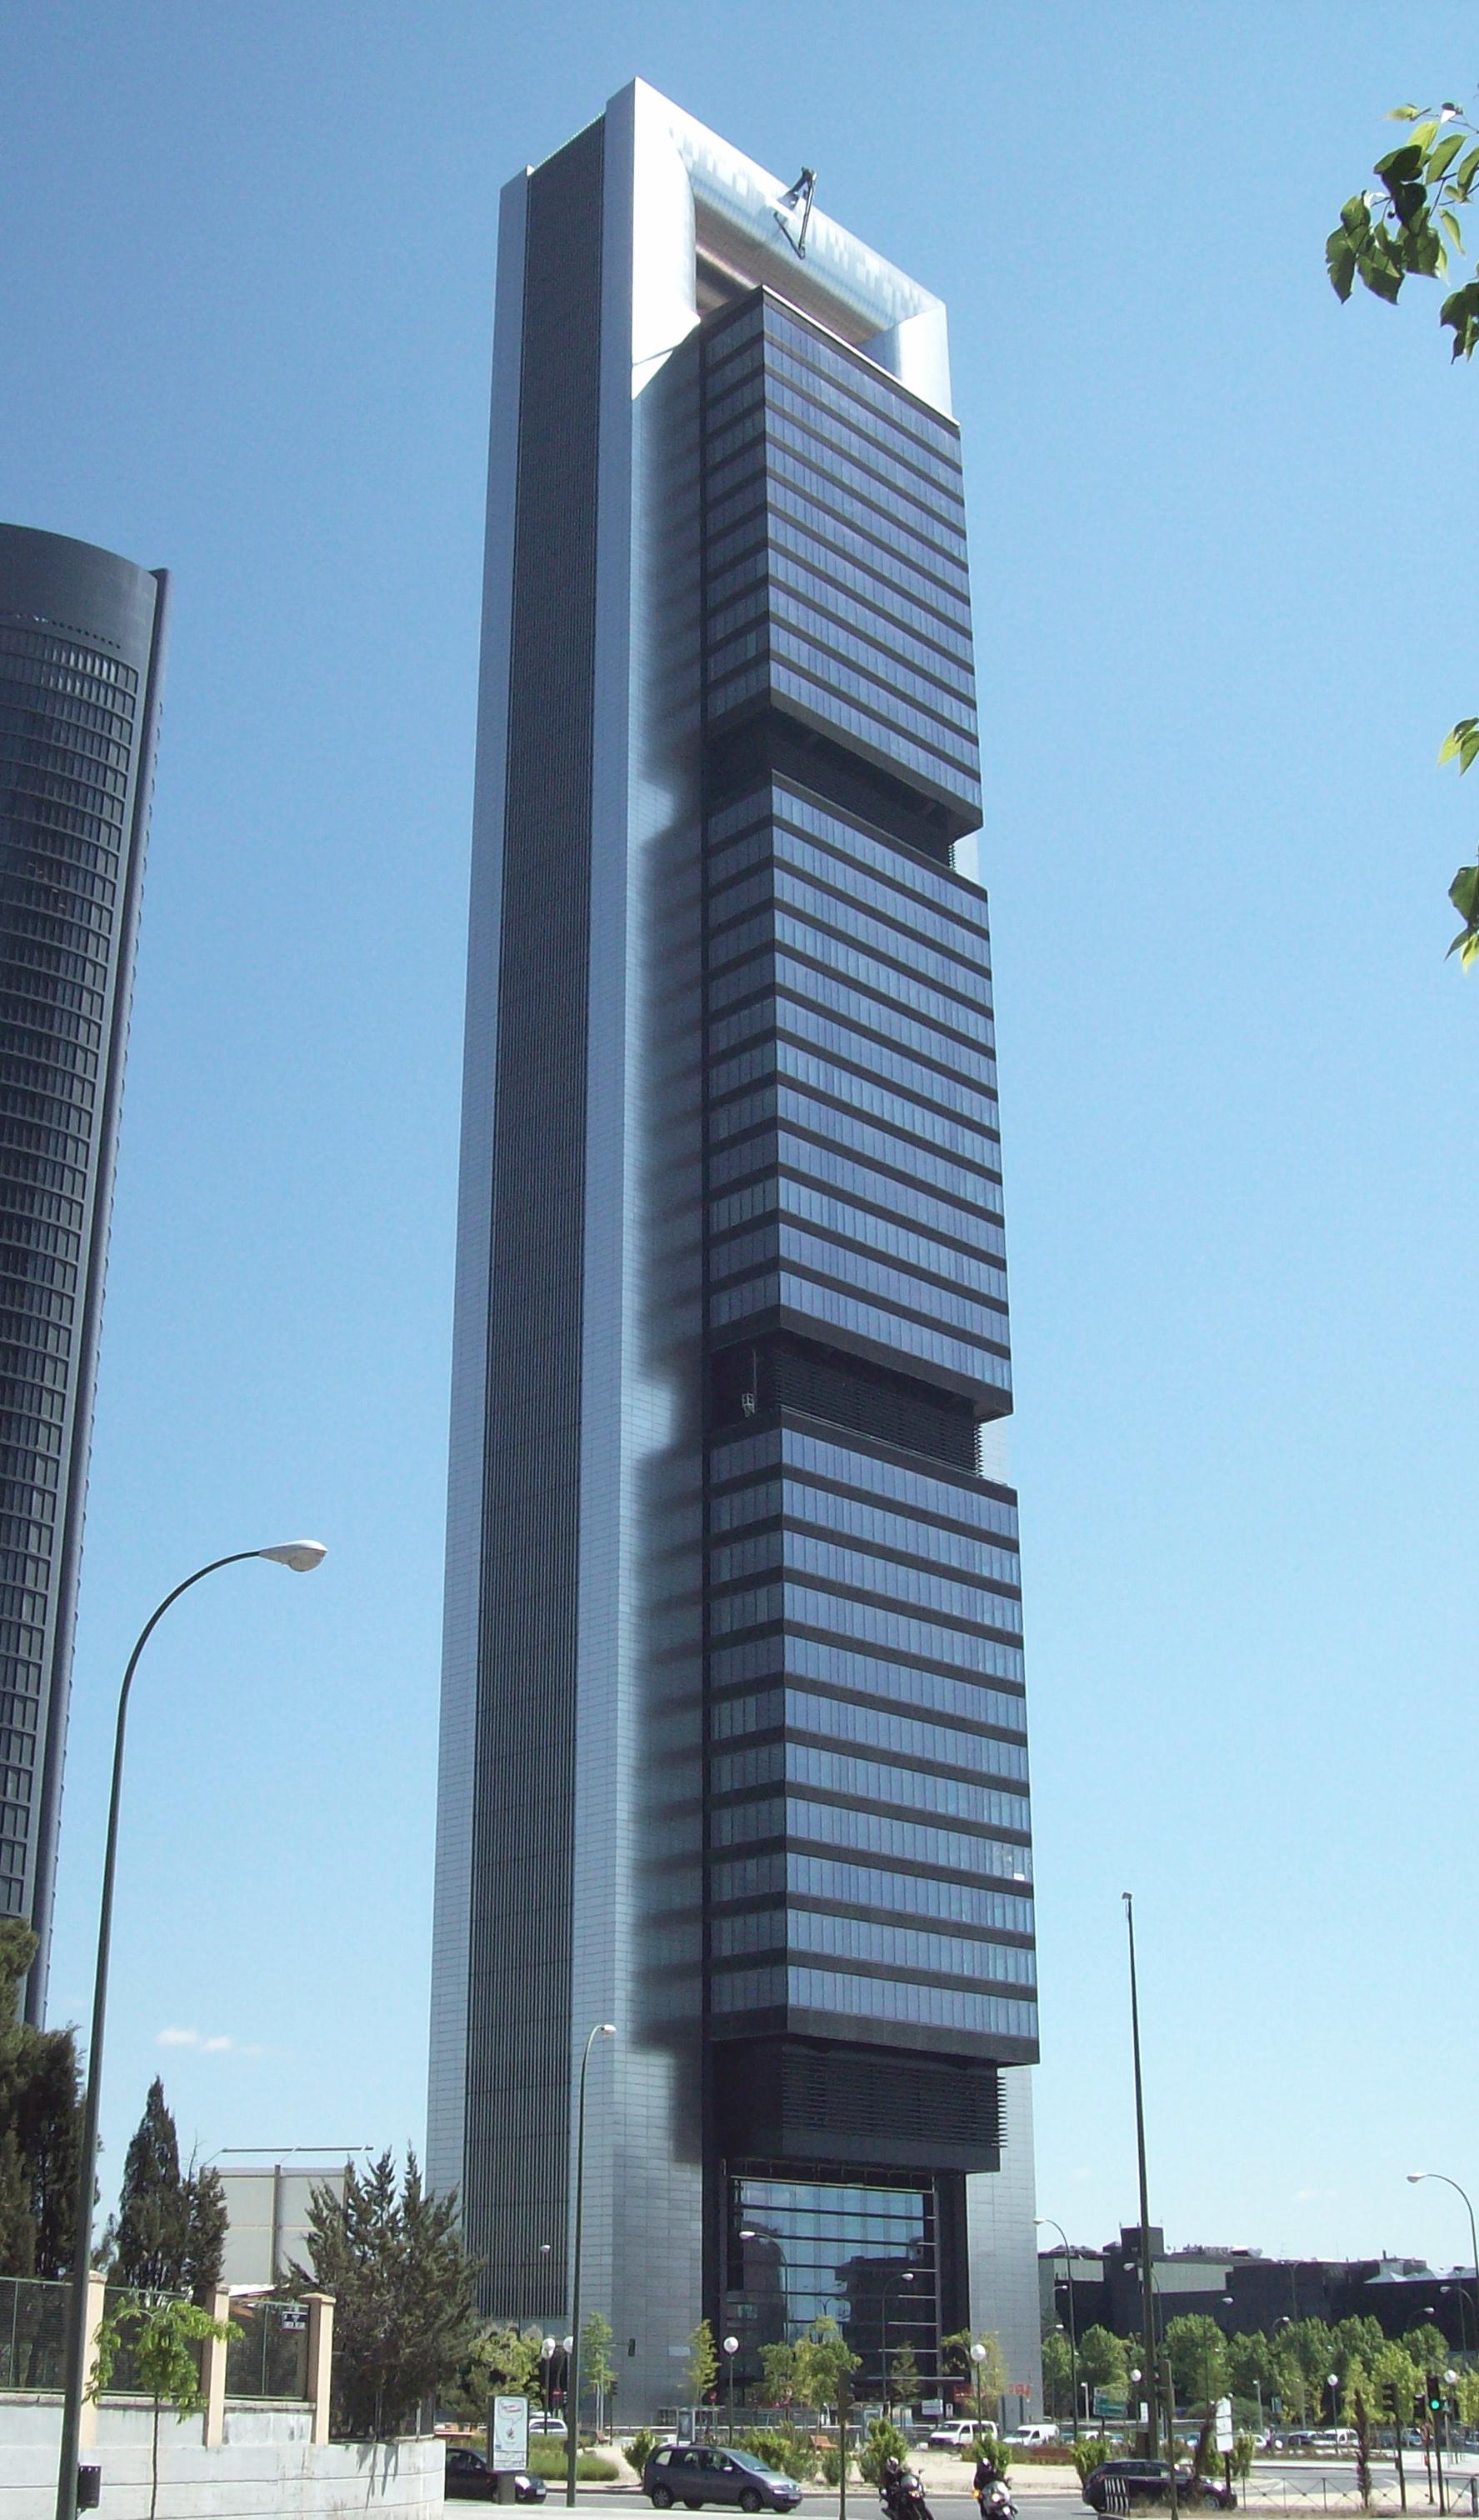 Torre cepsa wikipedia for Caja madrid oficina de internet